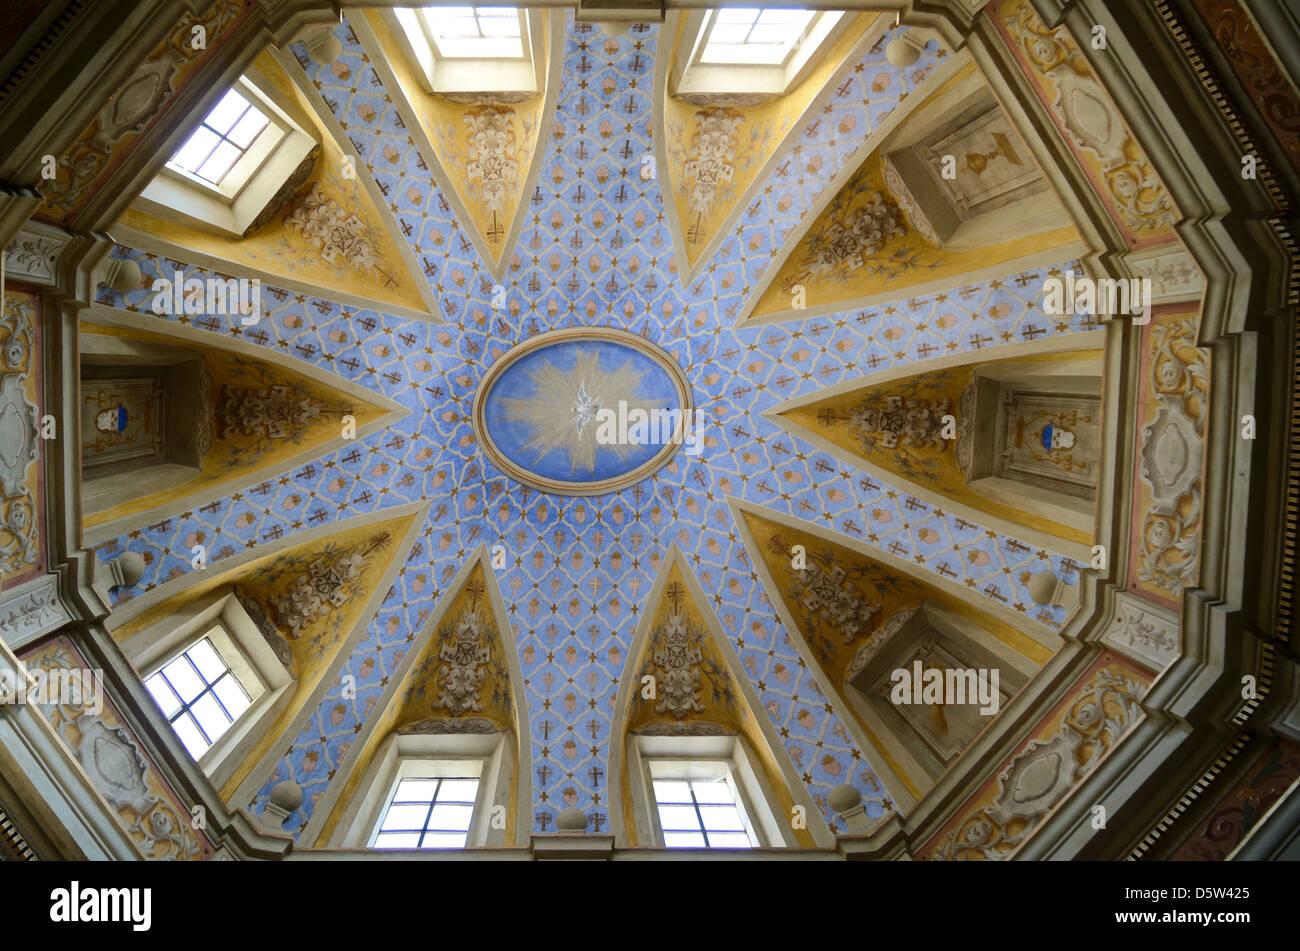 Malte Barockdecke und innere St. Michel Kapelle La Brig Roya-Tal Alpes-Maritimes Frankreich Stockbild